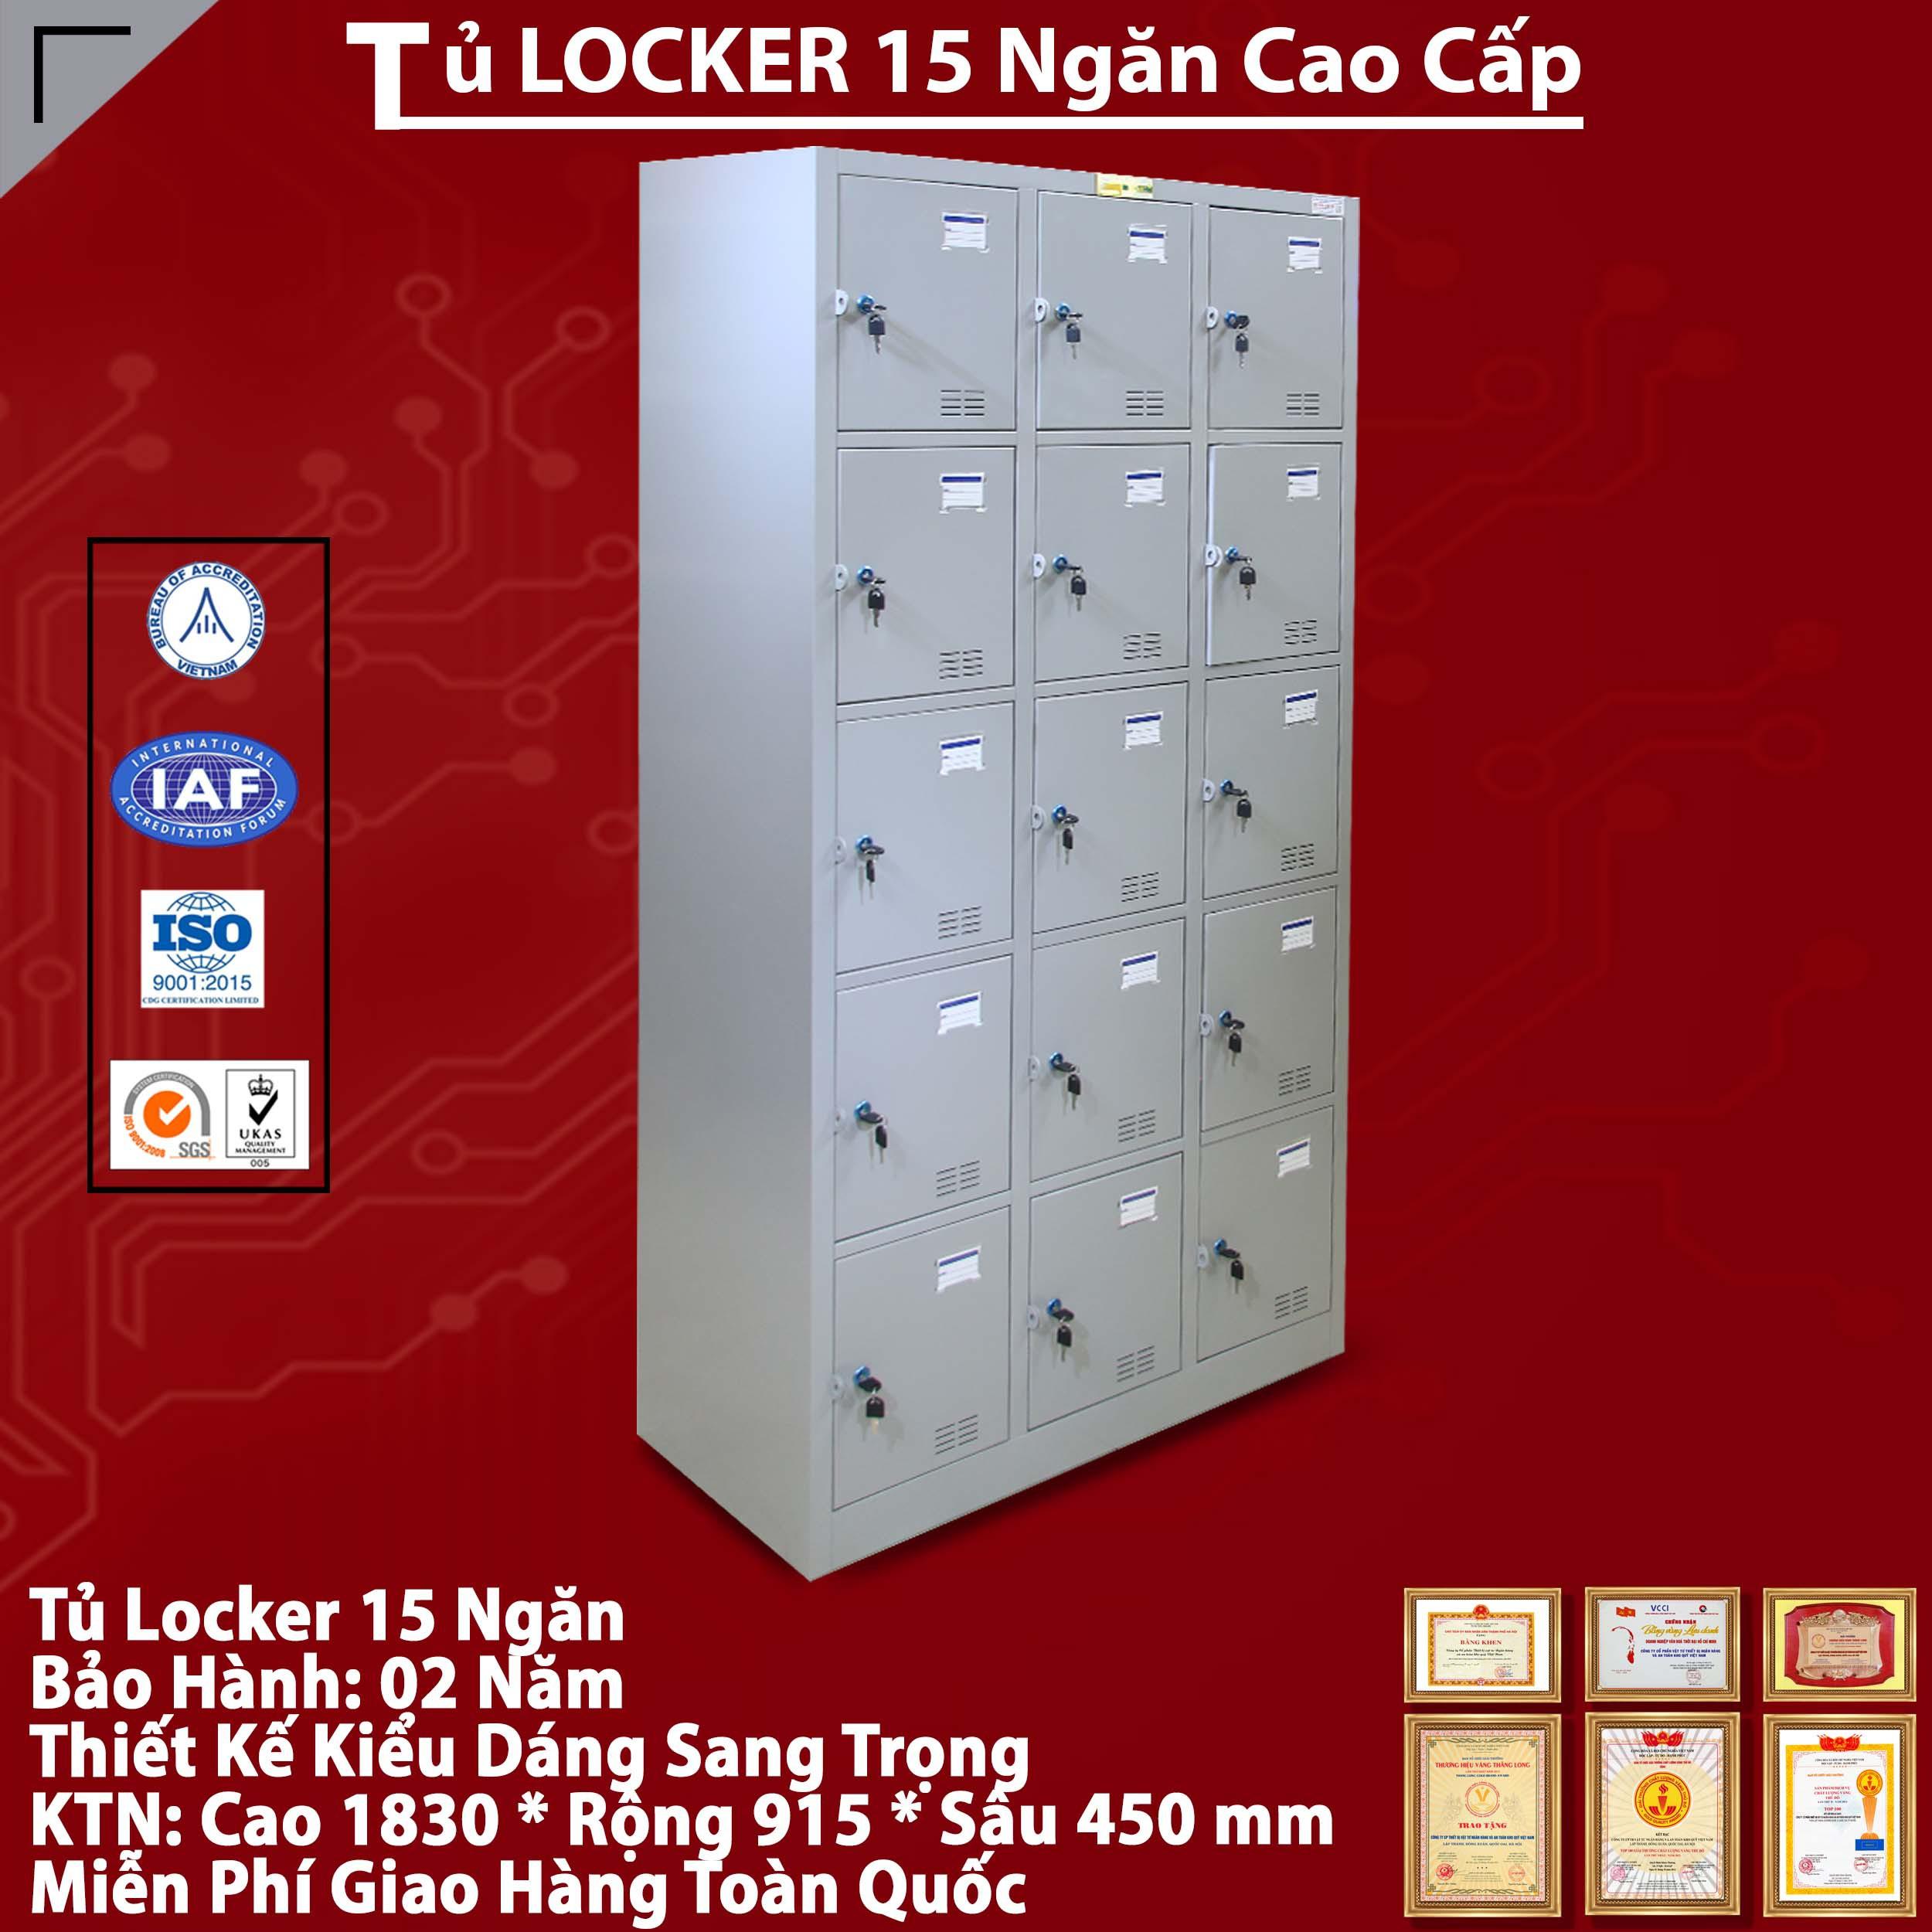 Tủ Locker 15 ngăn kiểu TU985-3K